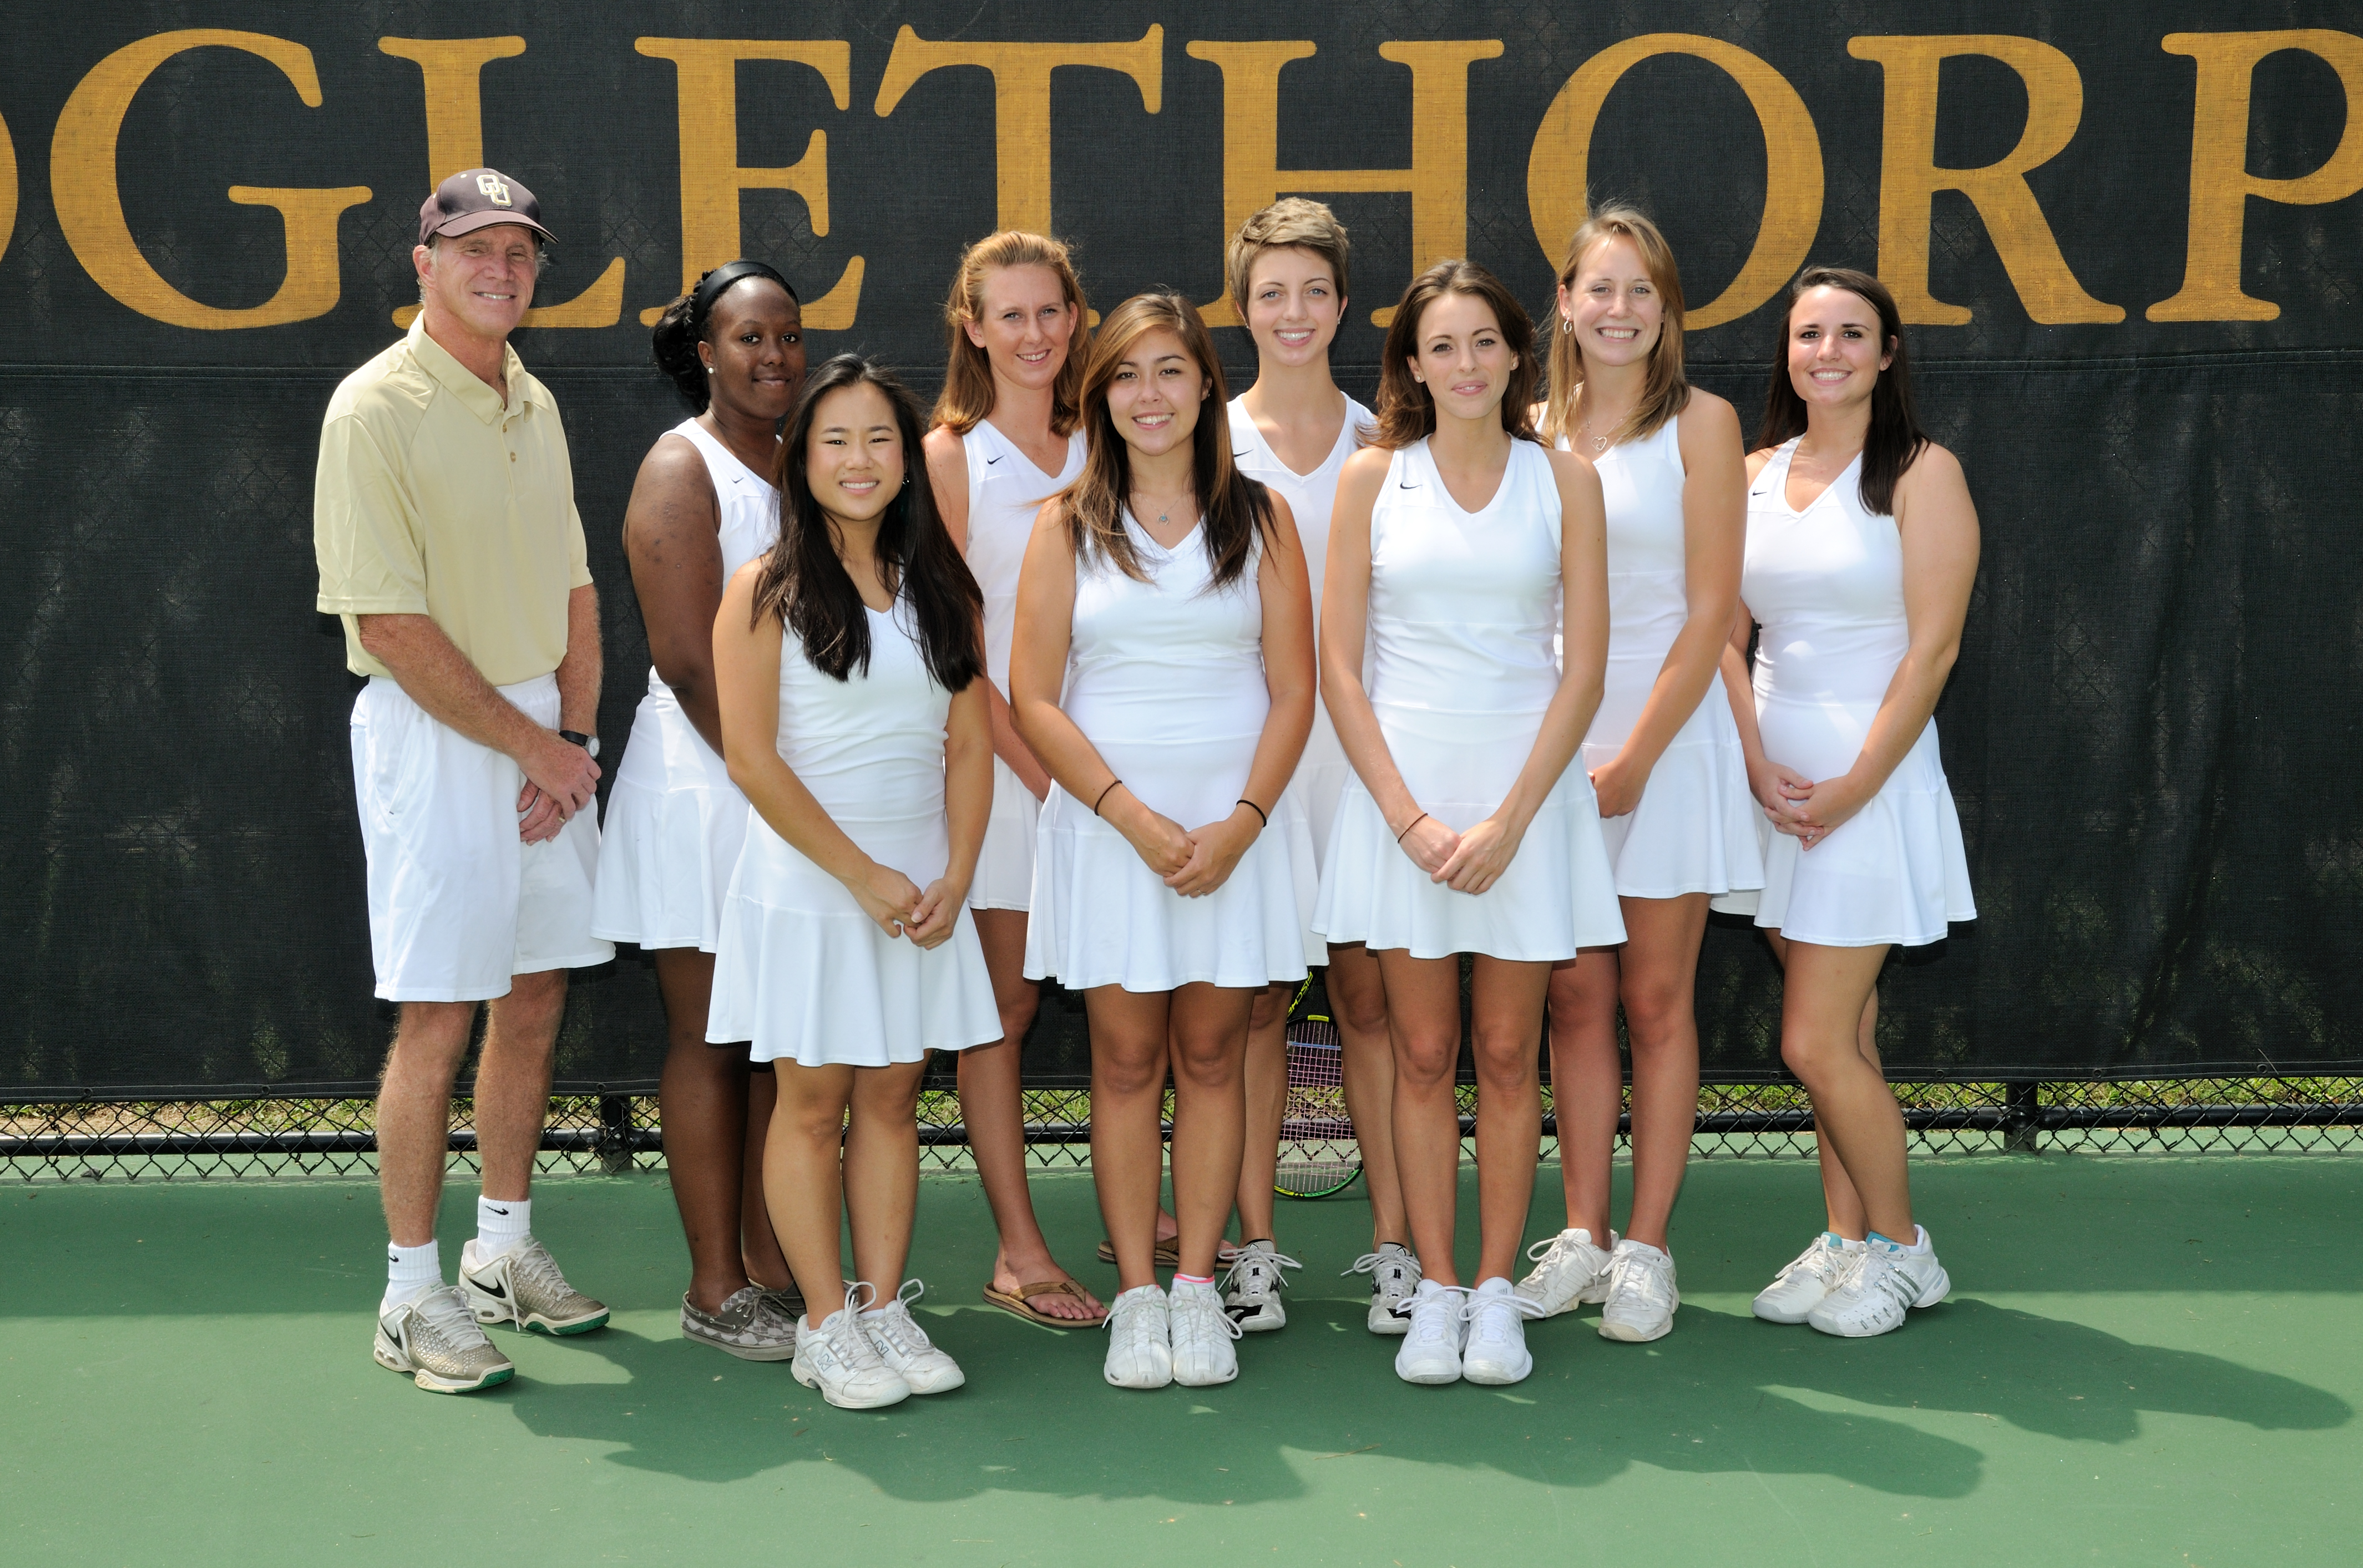 Latvian Women Tennis 88